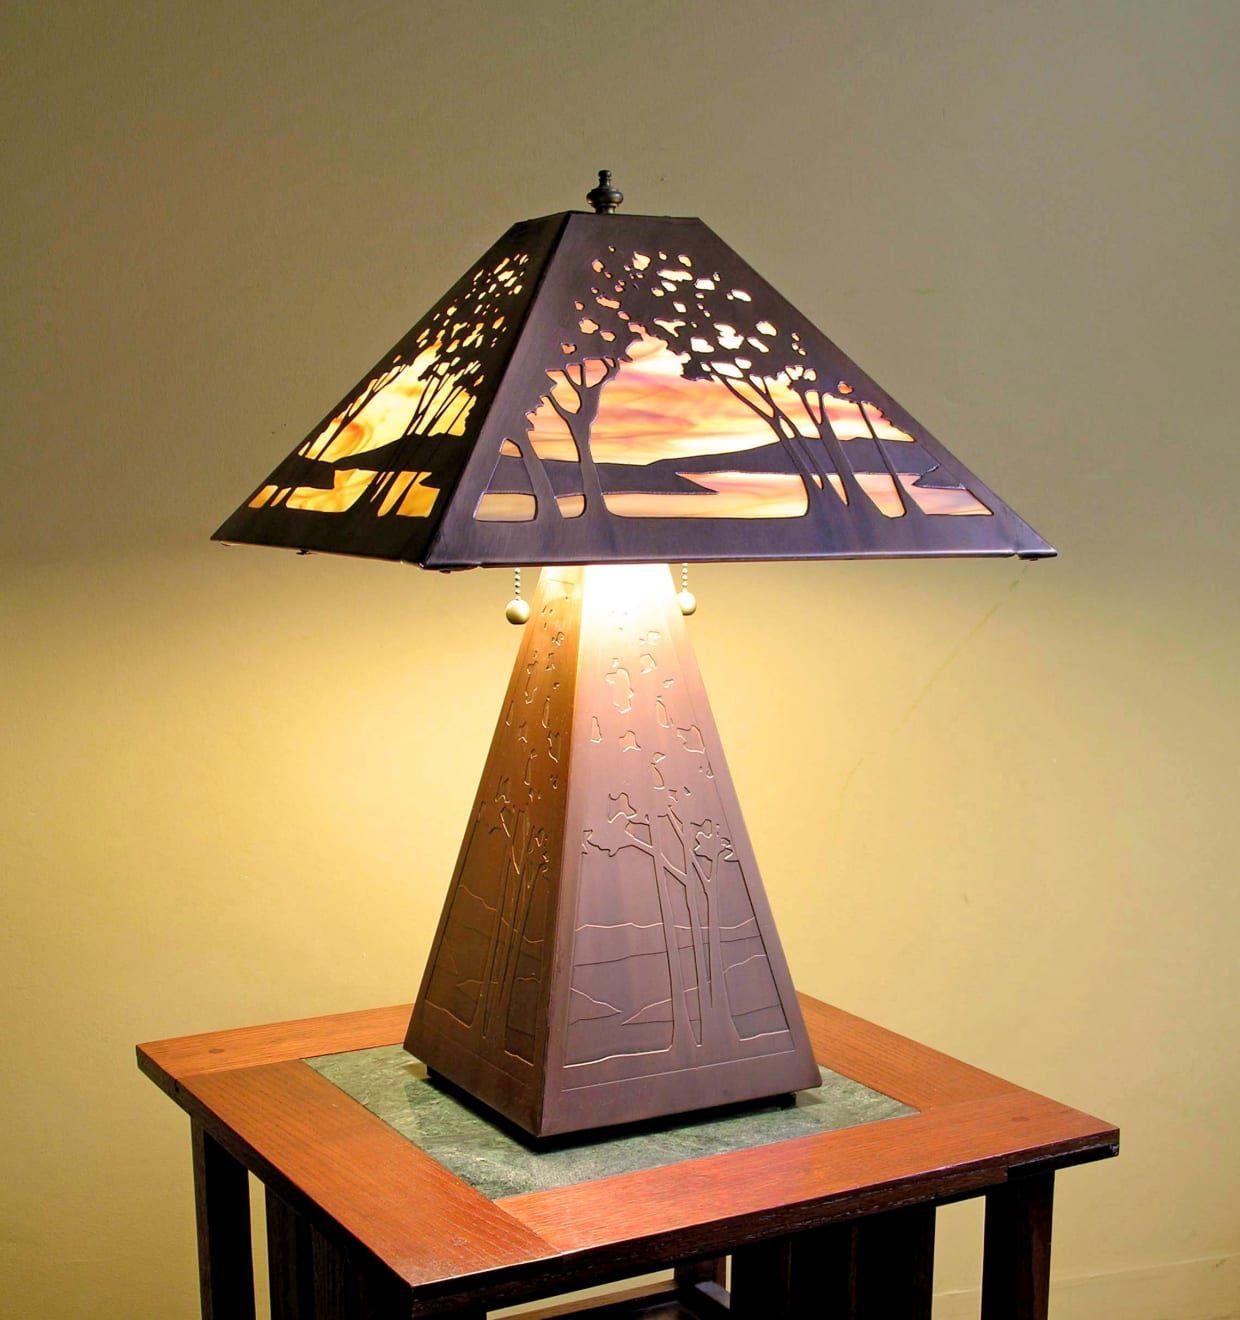 The Guild James Mattson Coppercraft Craftsman Lamps Lamp Craftsman Furniture